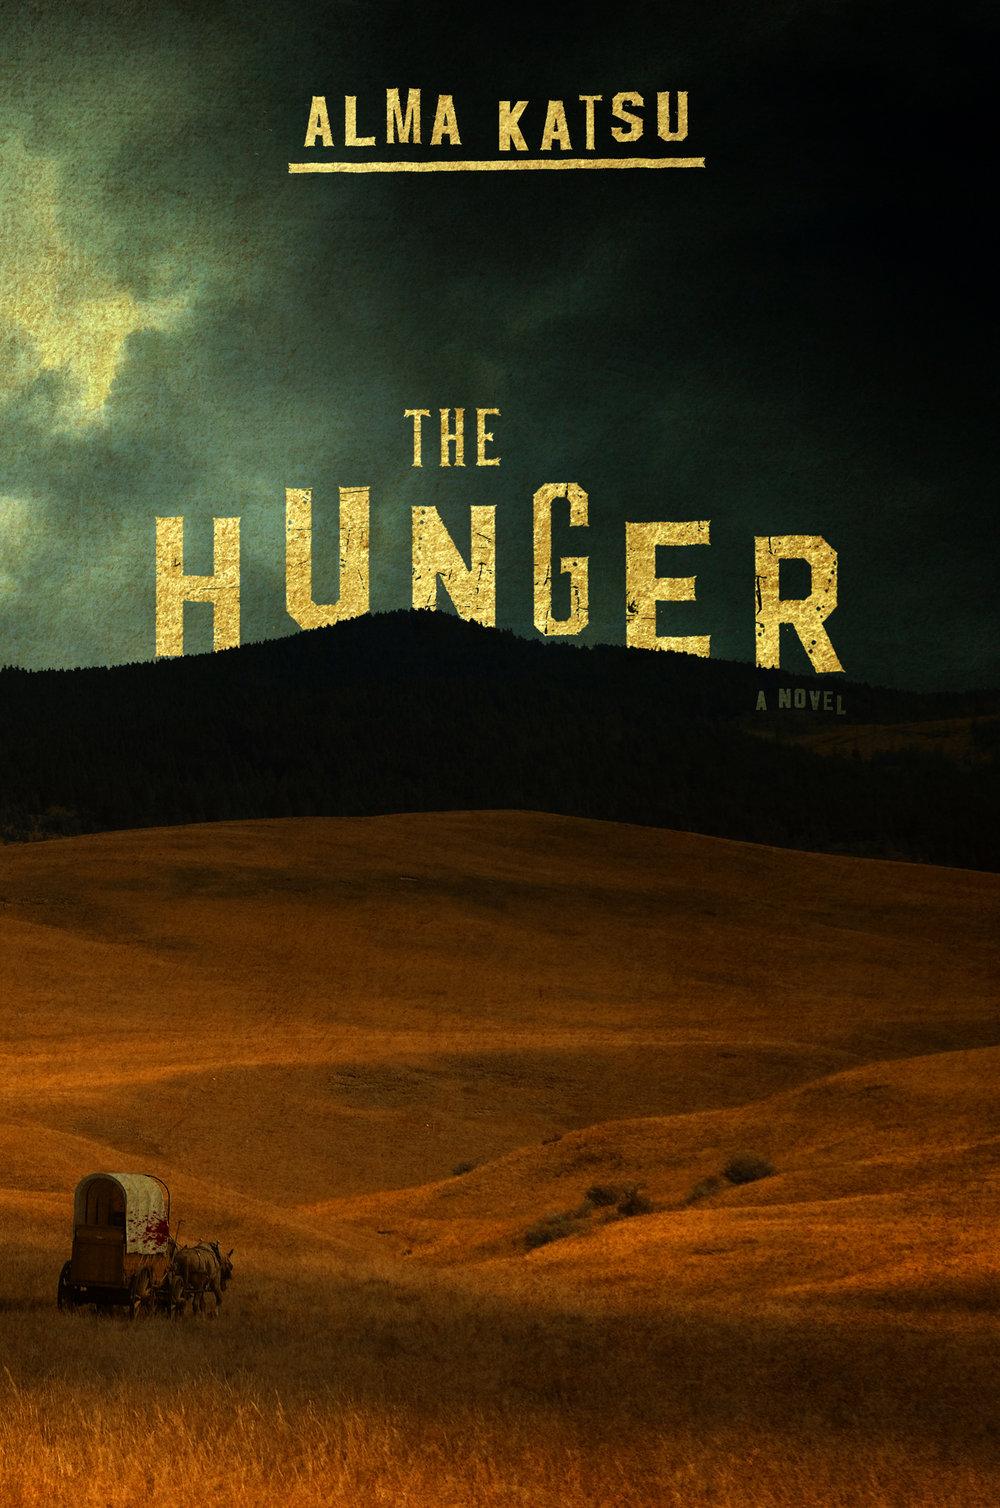 The Hunger_Alma Katsu.jpg